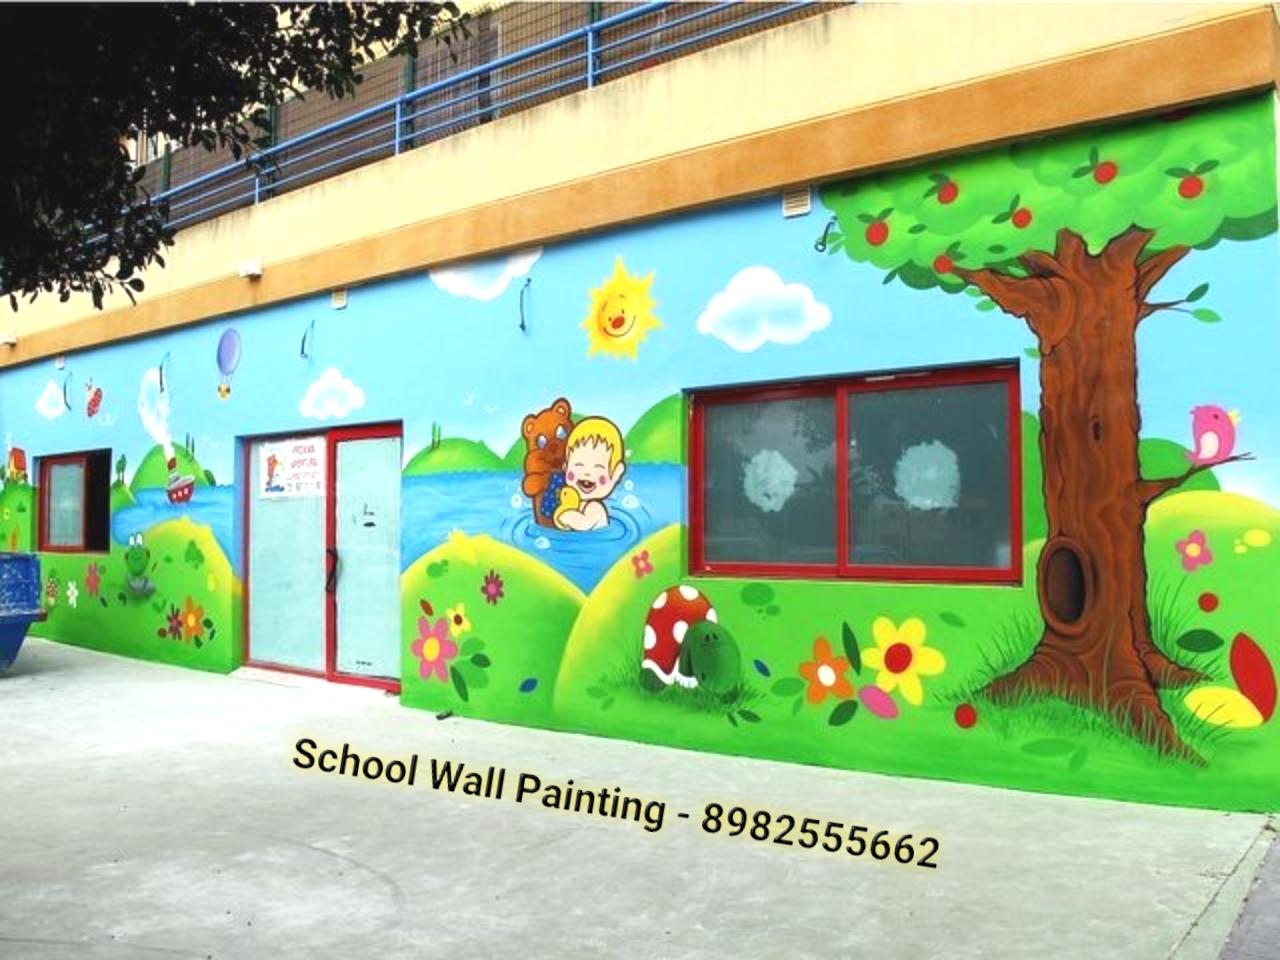 Playschool Wall Painting Nursery School Wall Painting Artist School Cartoon Painting Works Kids Room Wall Art Play School Wall Art Classroom Decoration